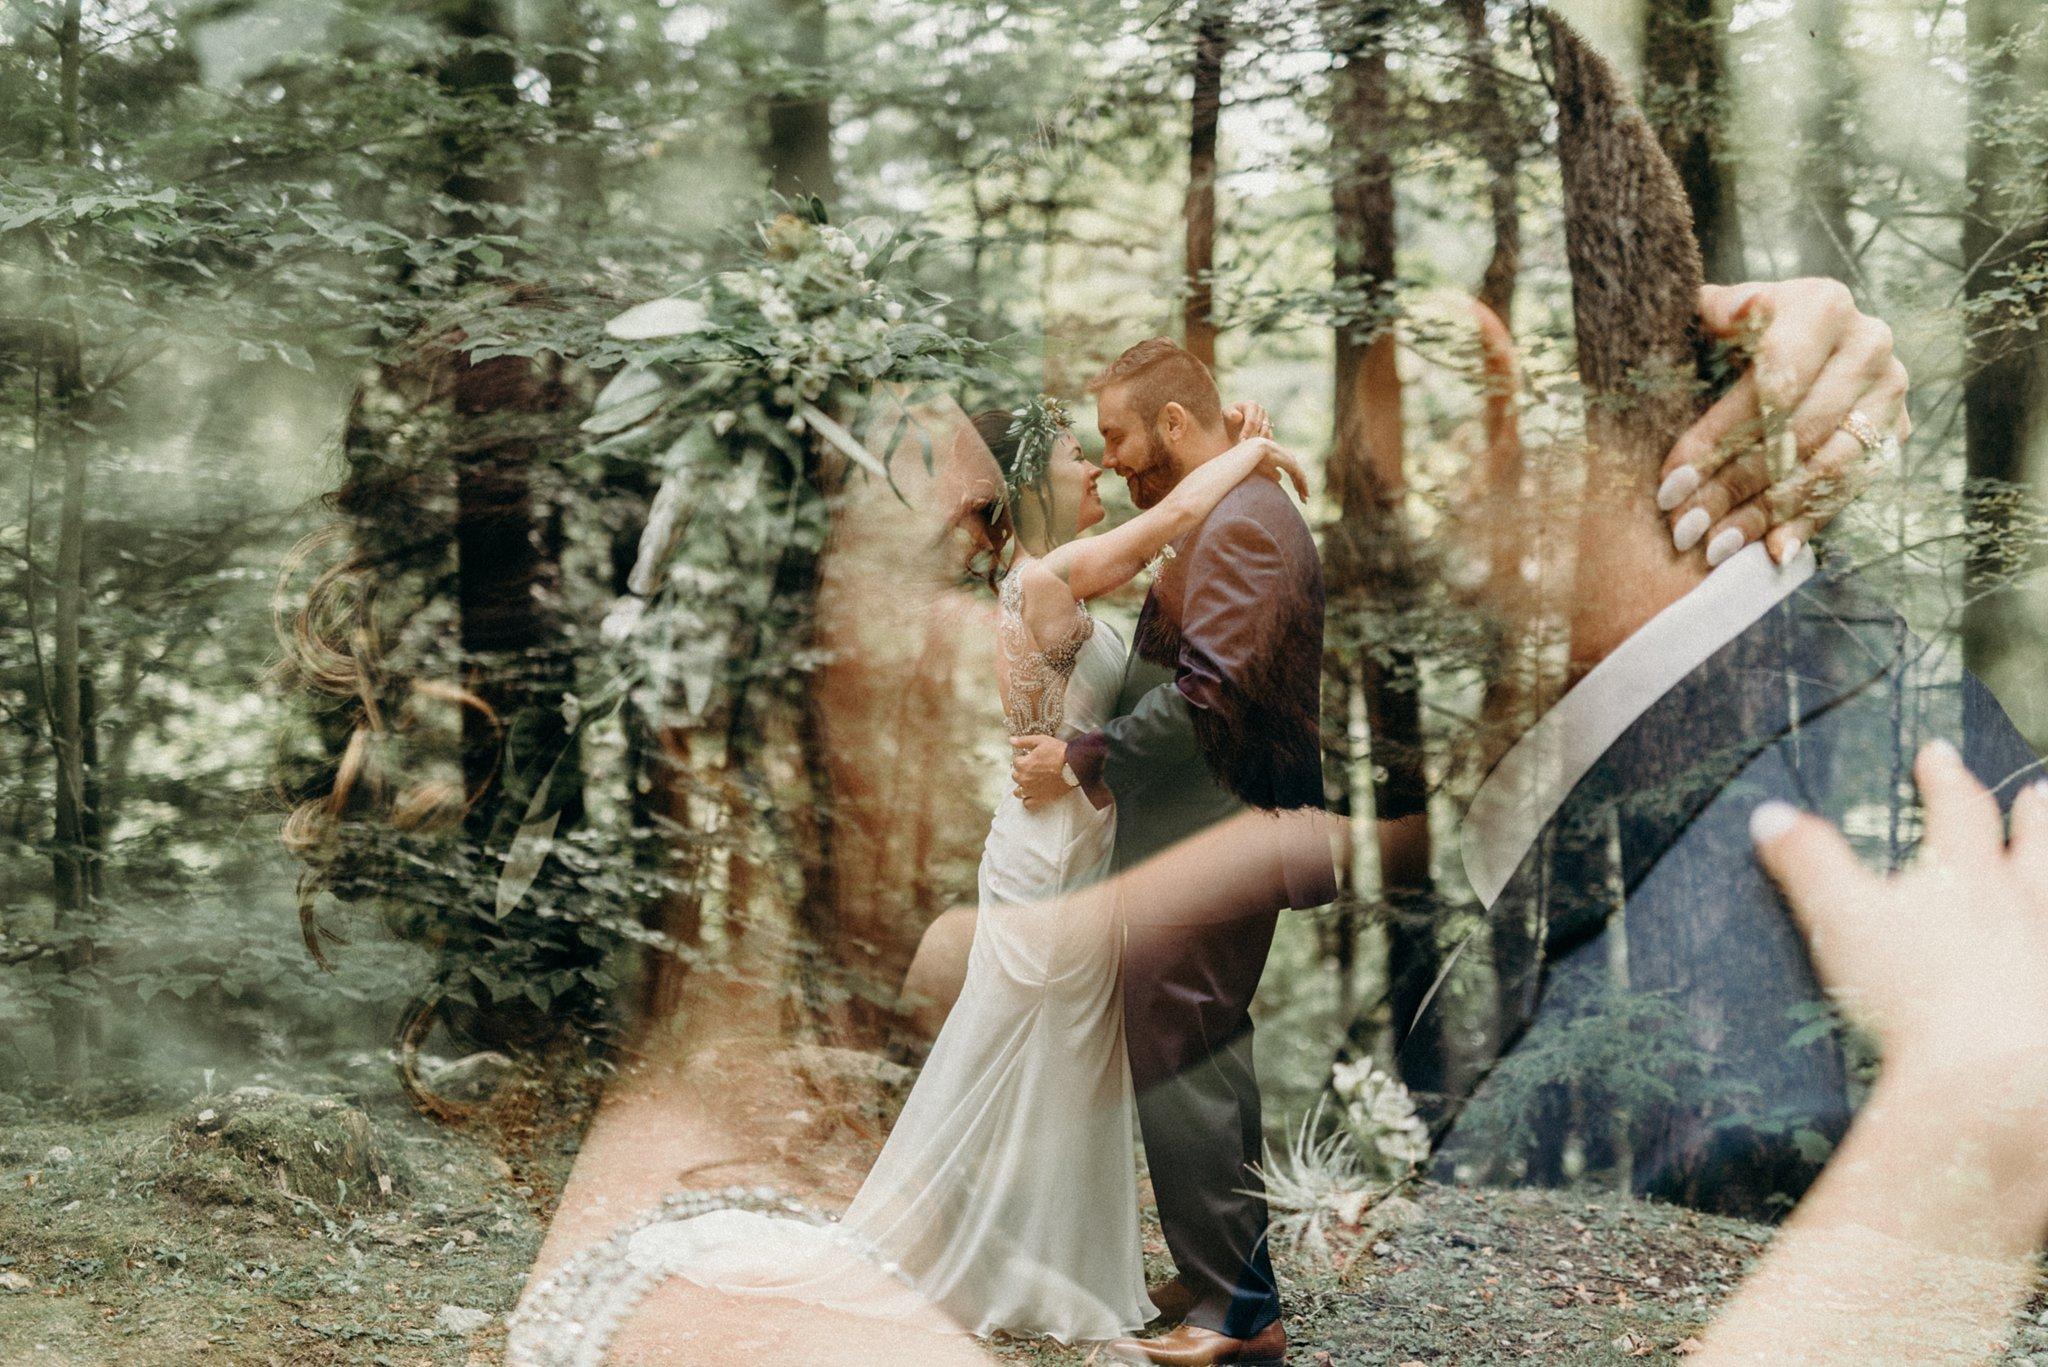 kaihla_tonai_intimate_wedding_elopement_photographer_6589.jpg